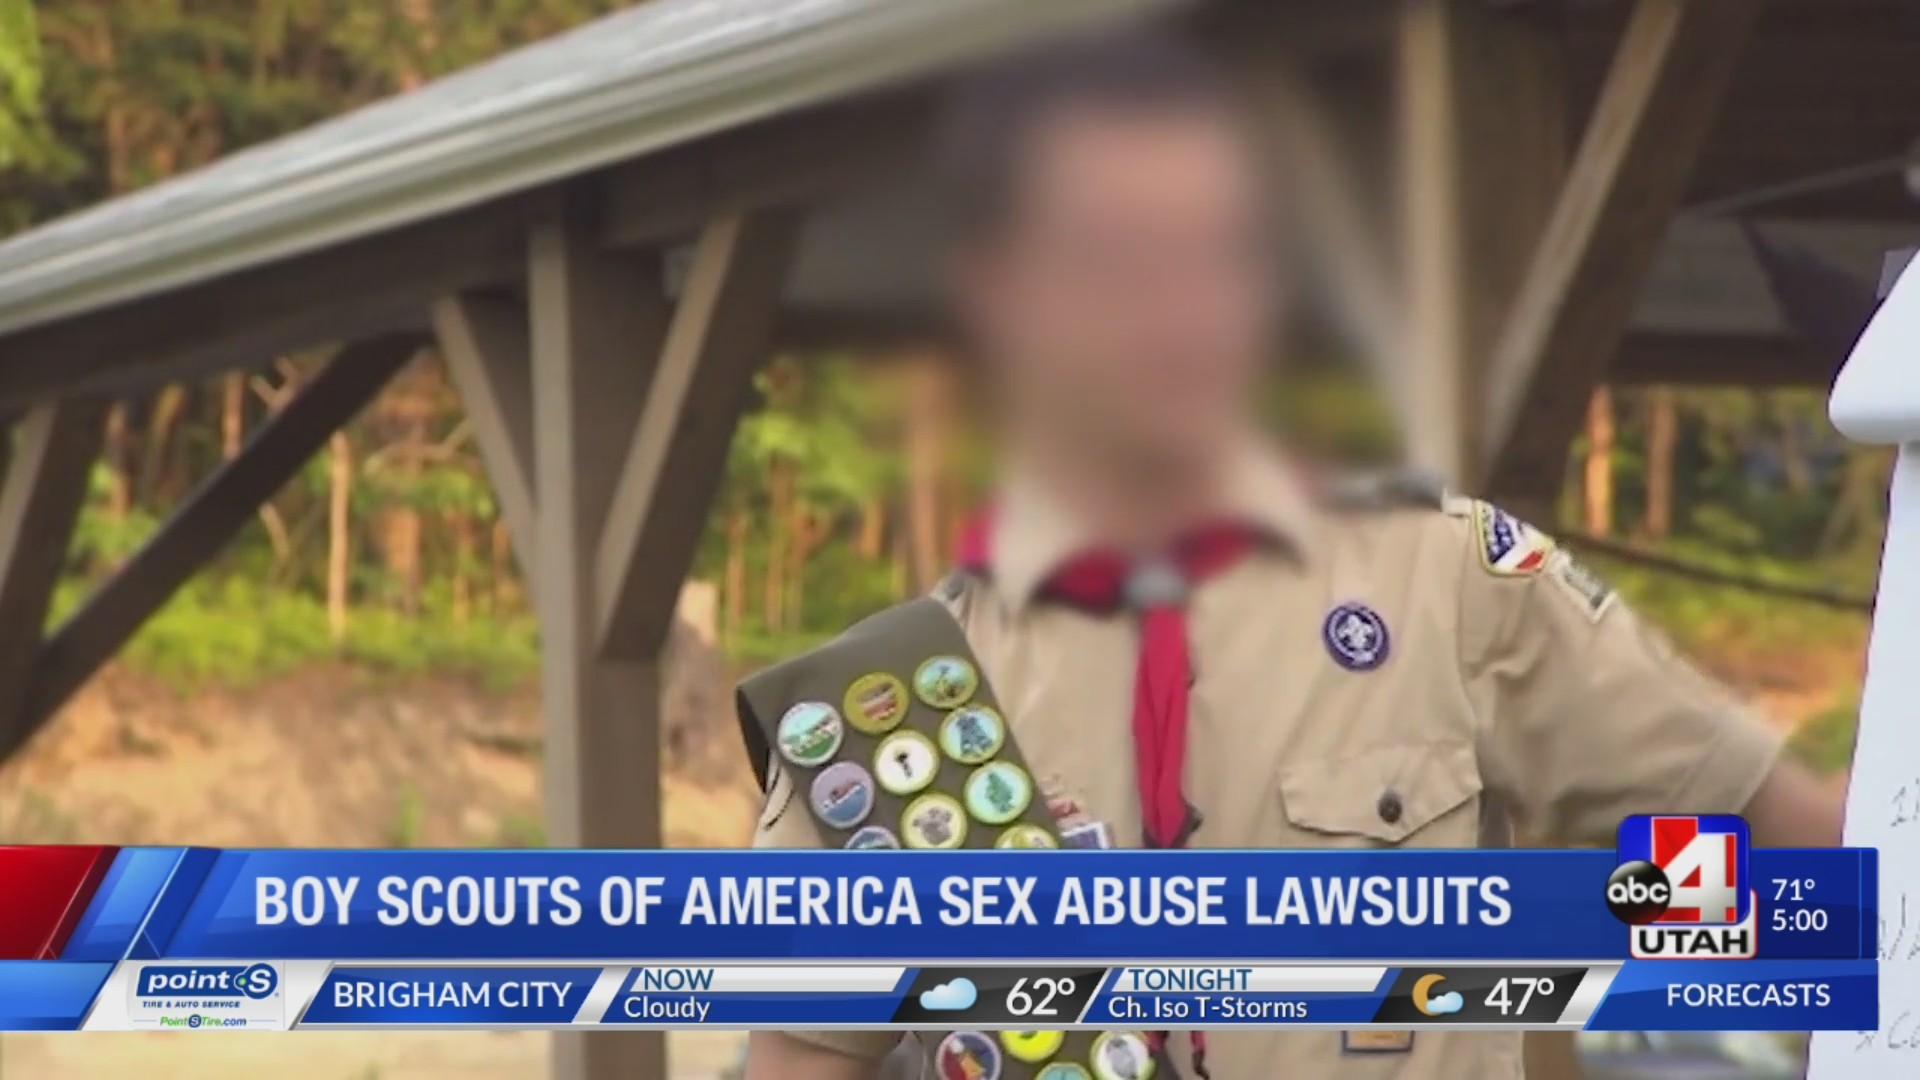 Boy_Scouts_of_America_lawsuit__5_p_m___0_20190424232225